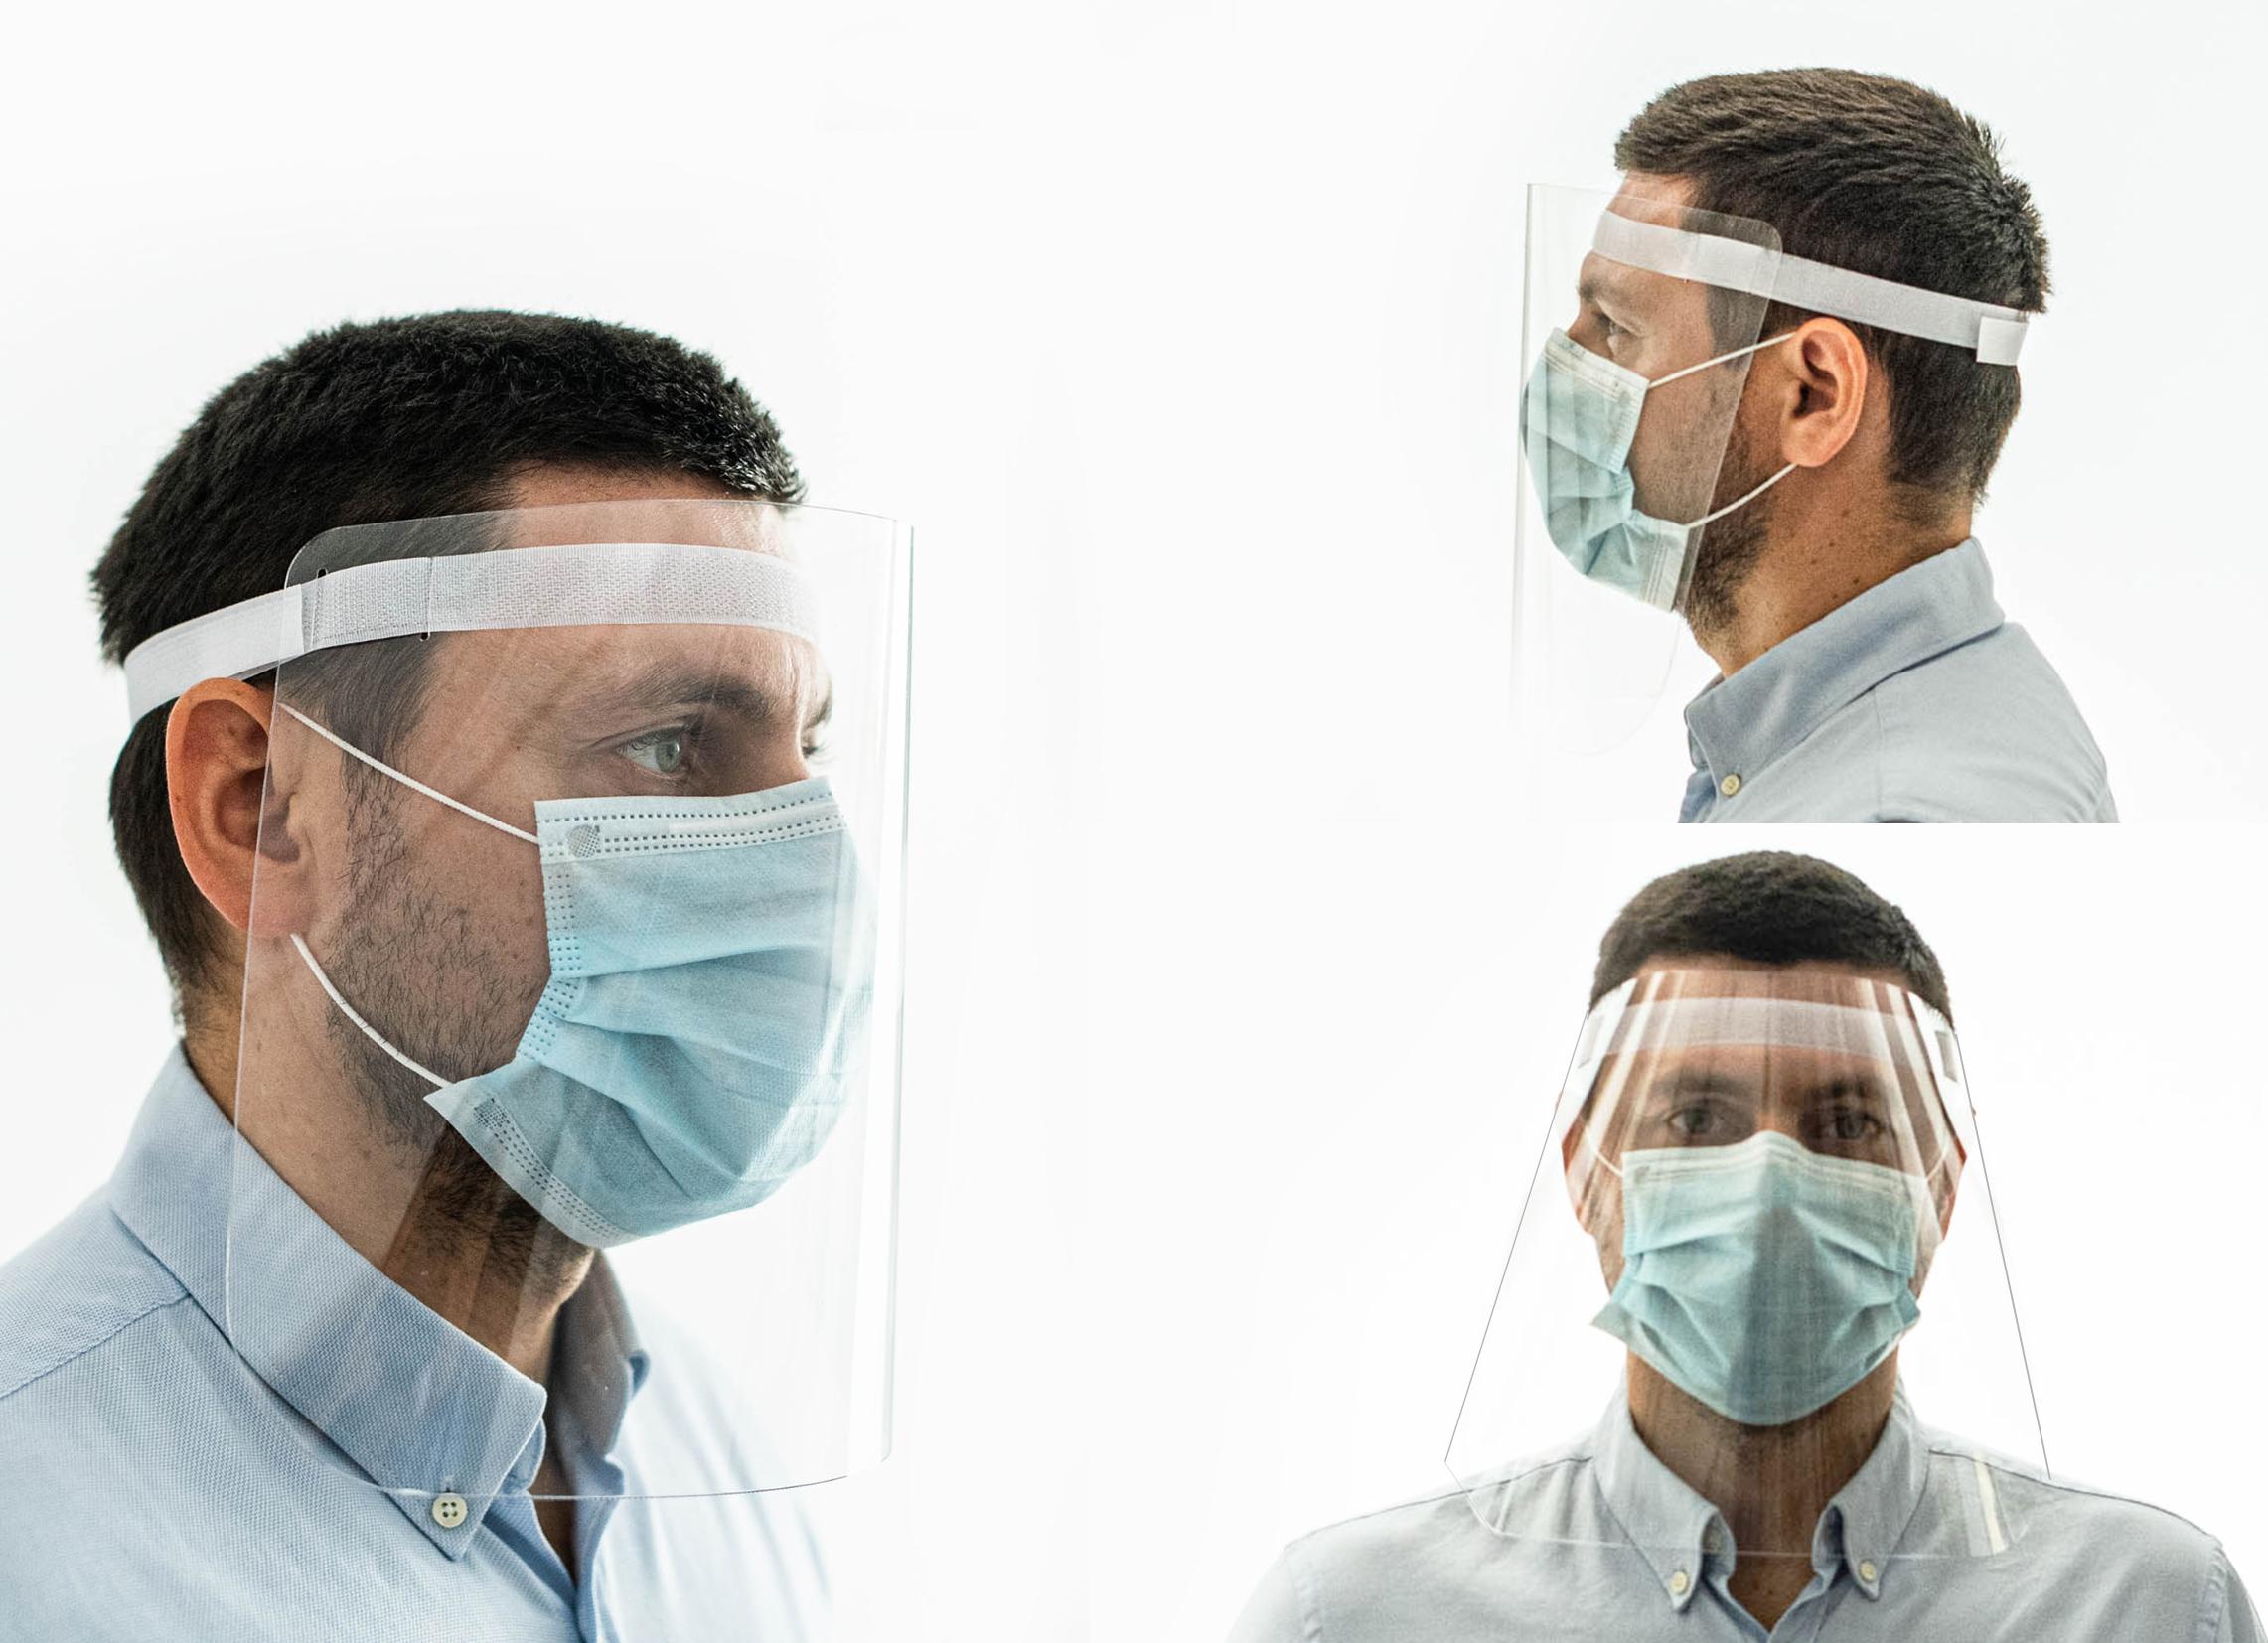 viziera1 Viziere viziera protectie viziere petg plexiglas policarbonat covid covid 19 coronavirus virosu protejare timisoara